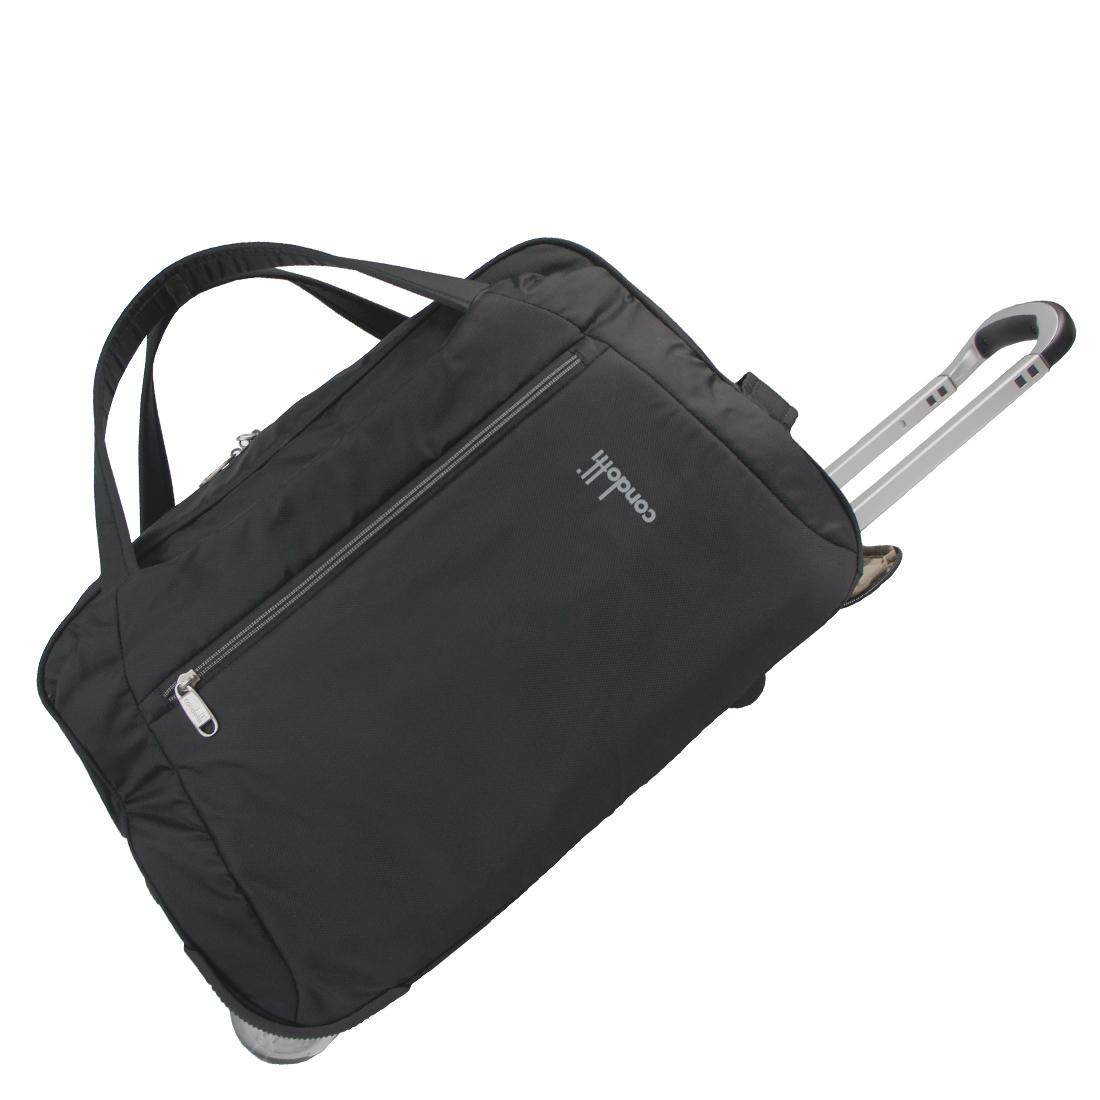 Condotti Travel Bag Trolley 63090 Lightweight 93e9097ebb